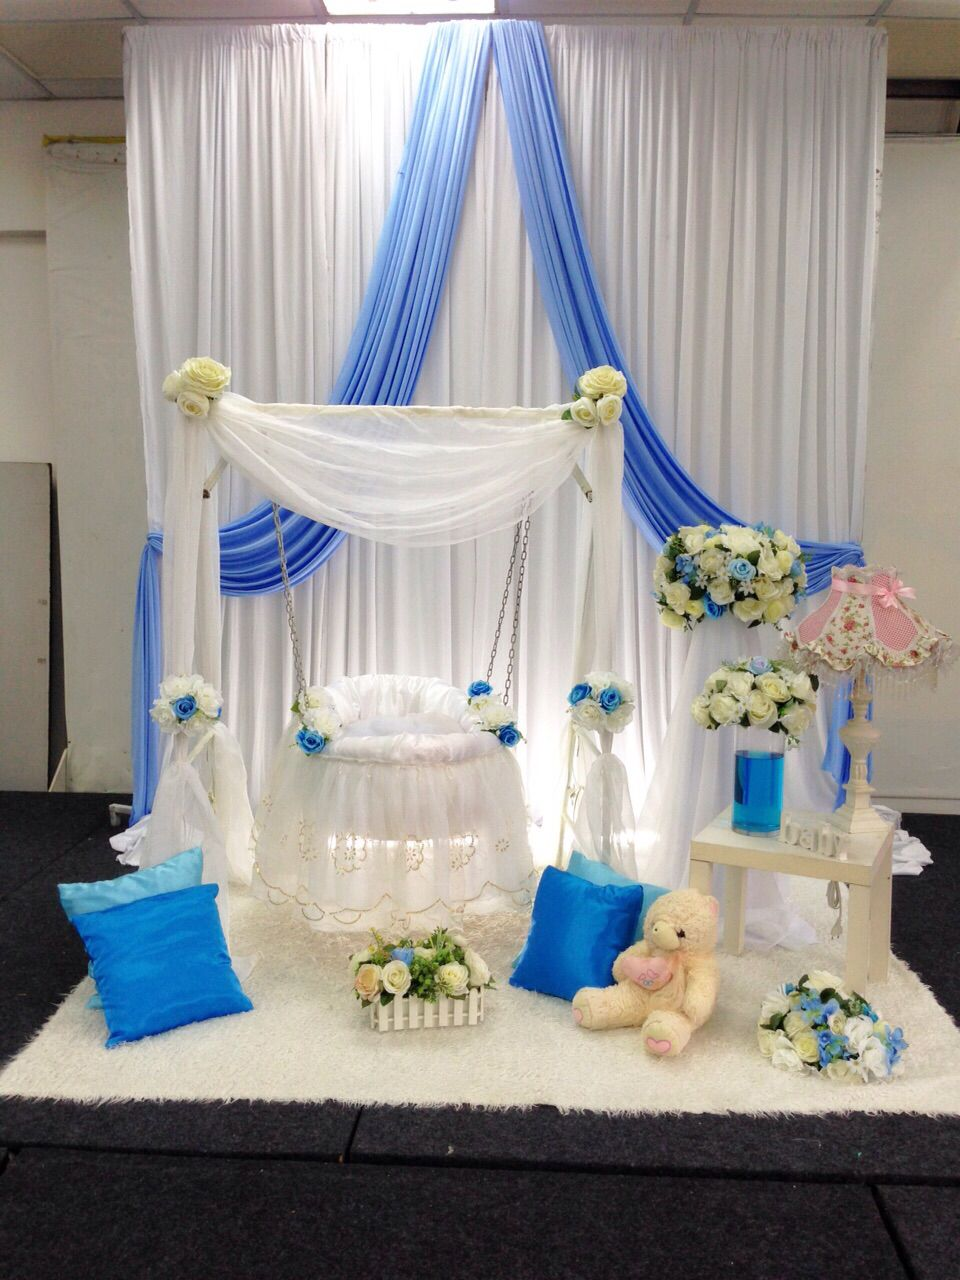 Pelamin buaian berendoi cukur jambul pakej aqiqah sweet for Baby name ceremony decoration